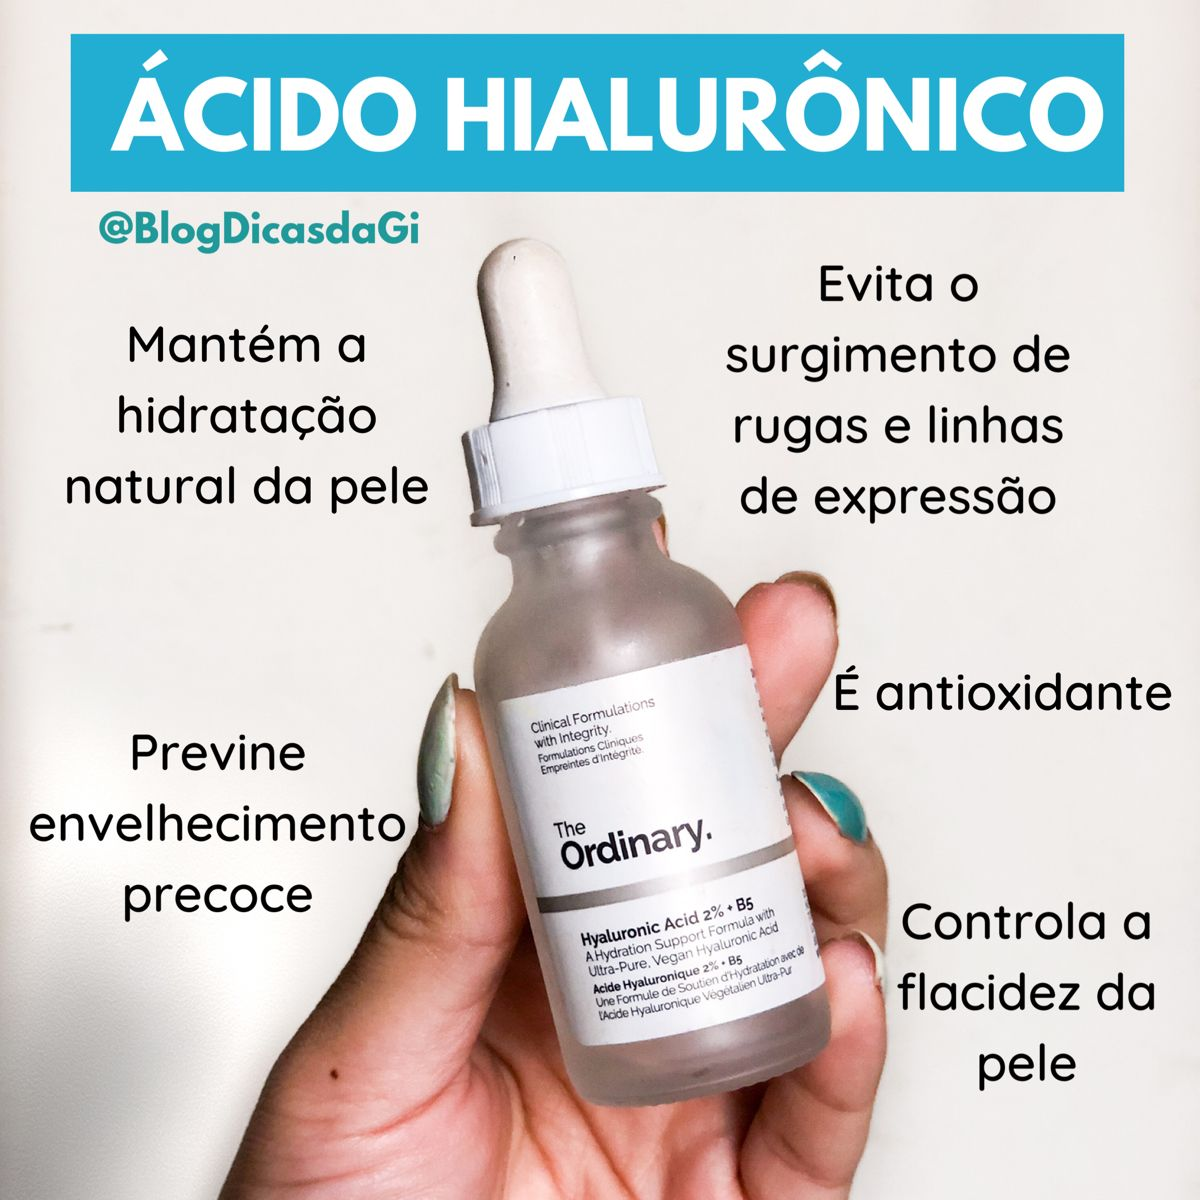 revitalize hialuronic usa